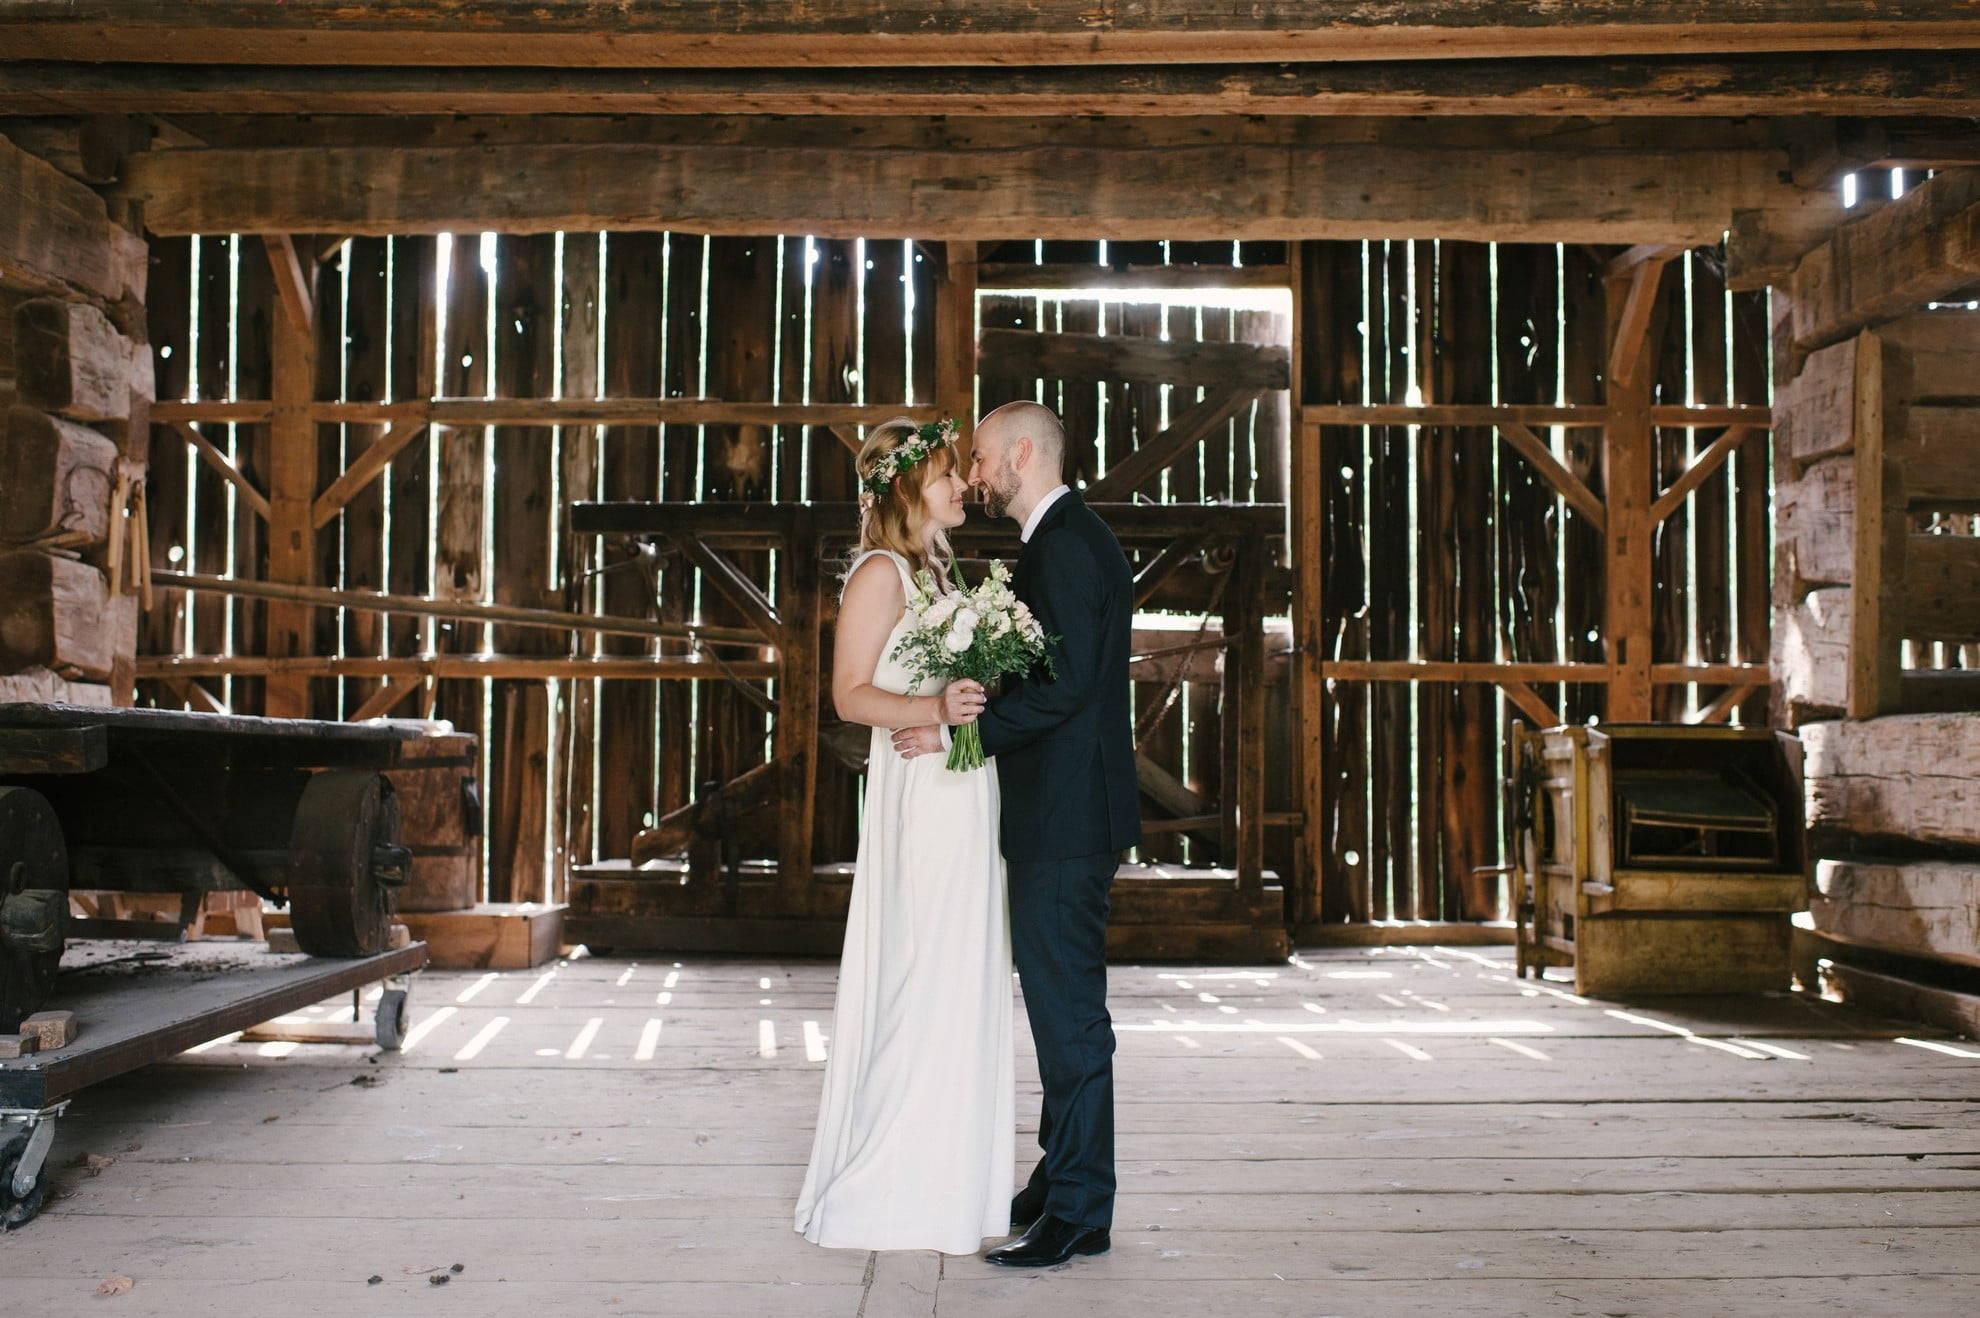 Hero image for Melissa and Egan's Wedding at Black Creek Pioneer Village